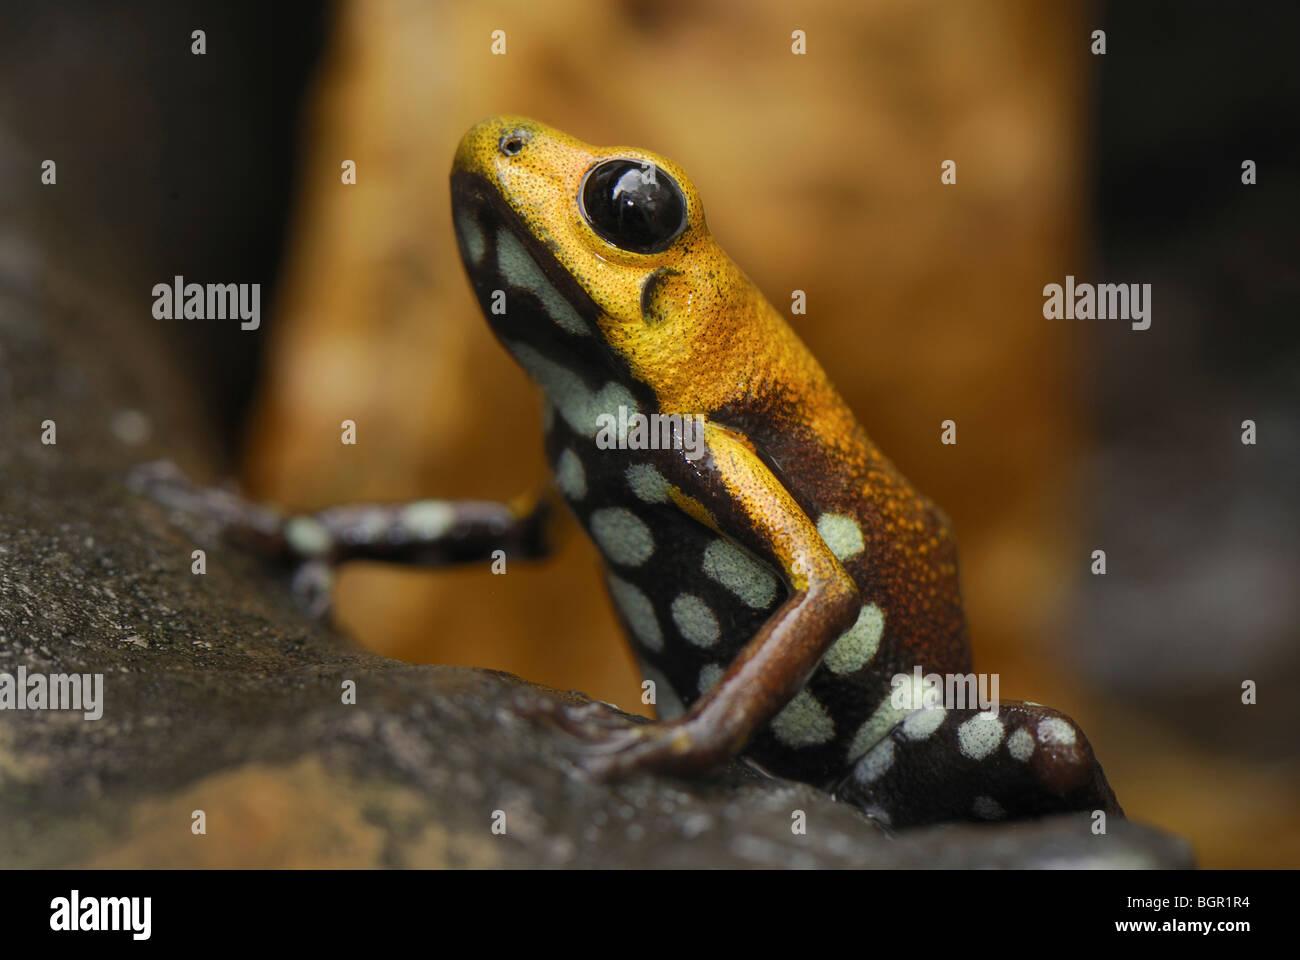 Poison Frog (Ranitomeya), Erwachsene, Depart. Cundinamarca, Kolumbien Stockbild